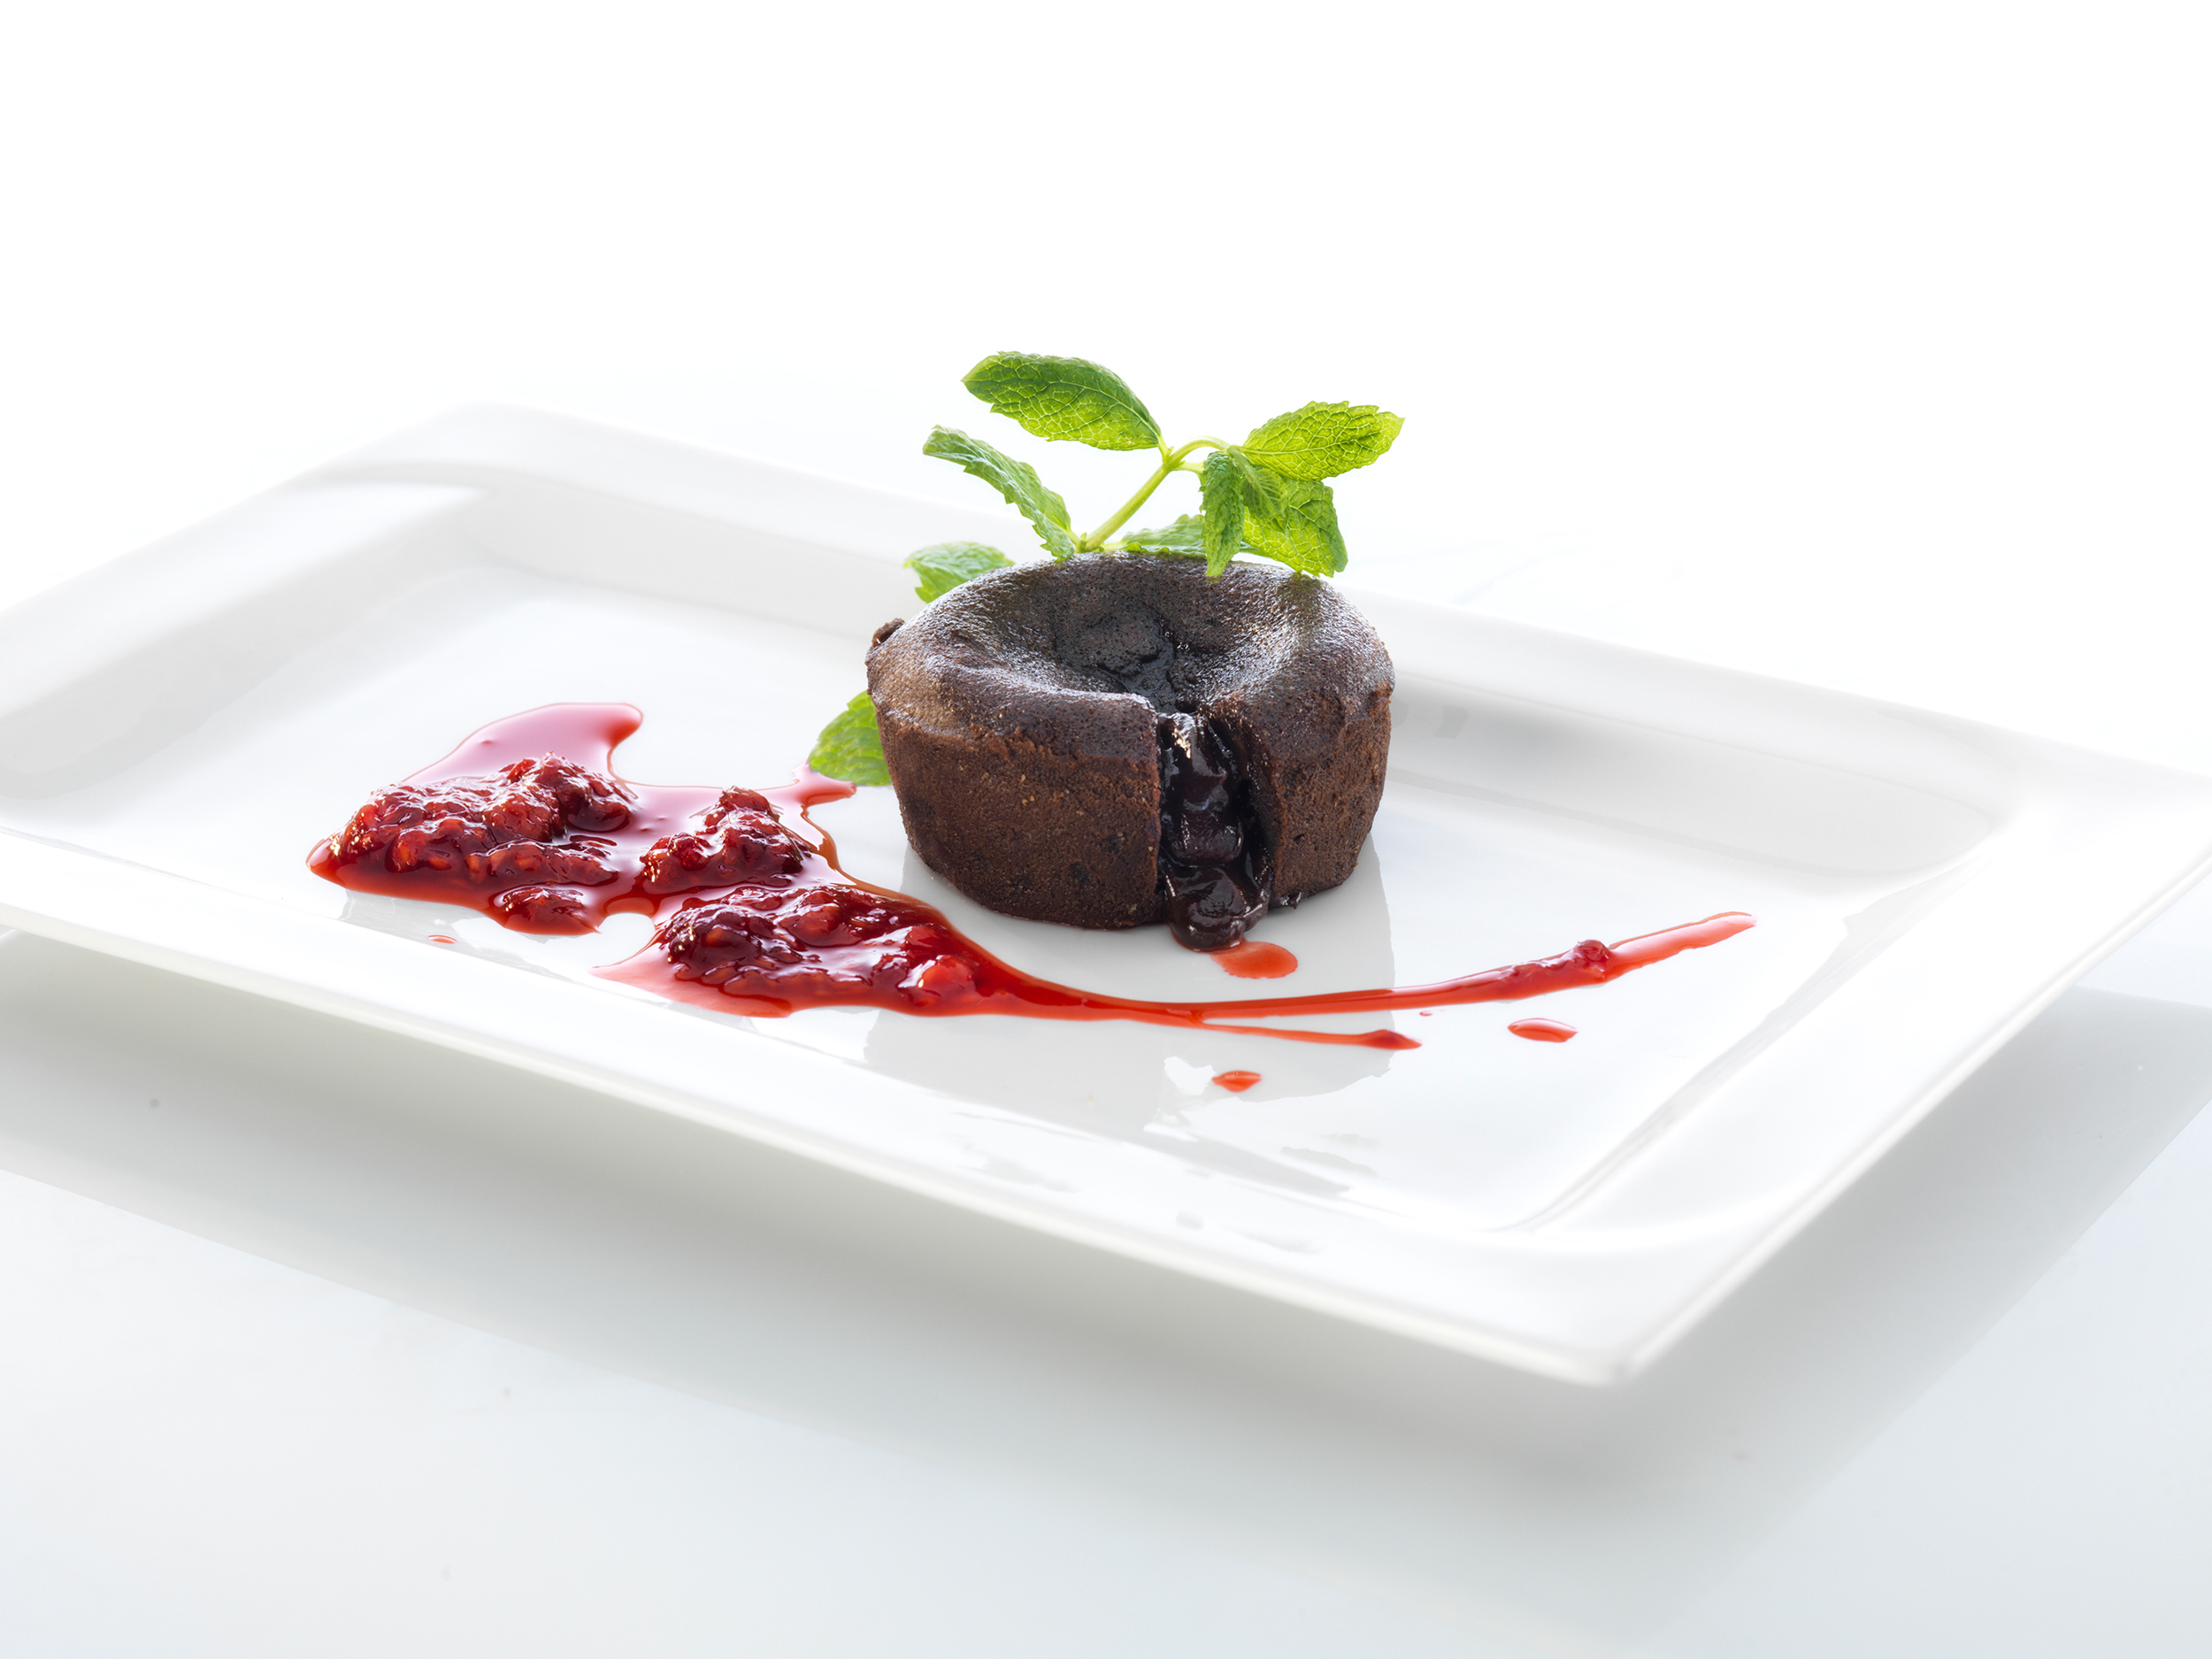 Chokladcake on a white plate